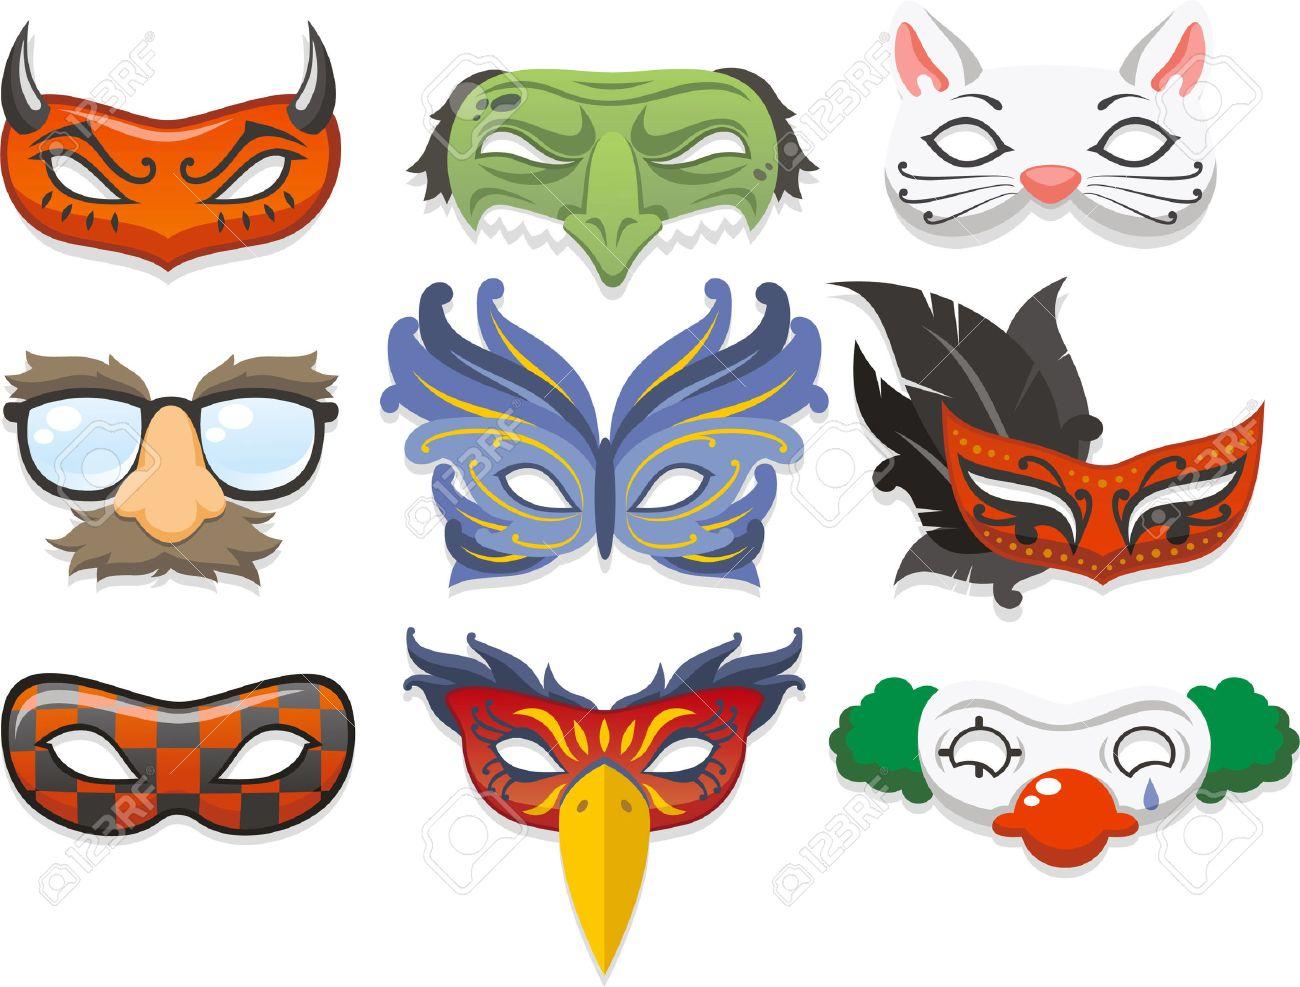 Halloween Costume Mask Cartoon Illustration Icons Royalty Free ...